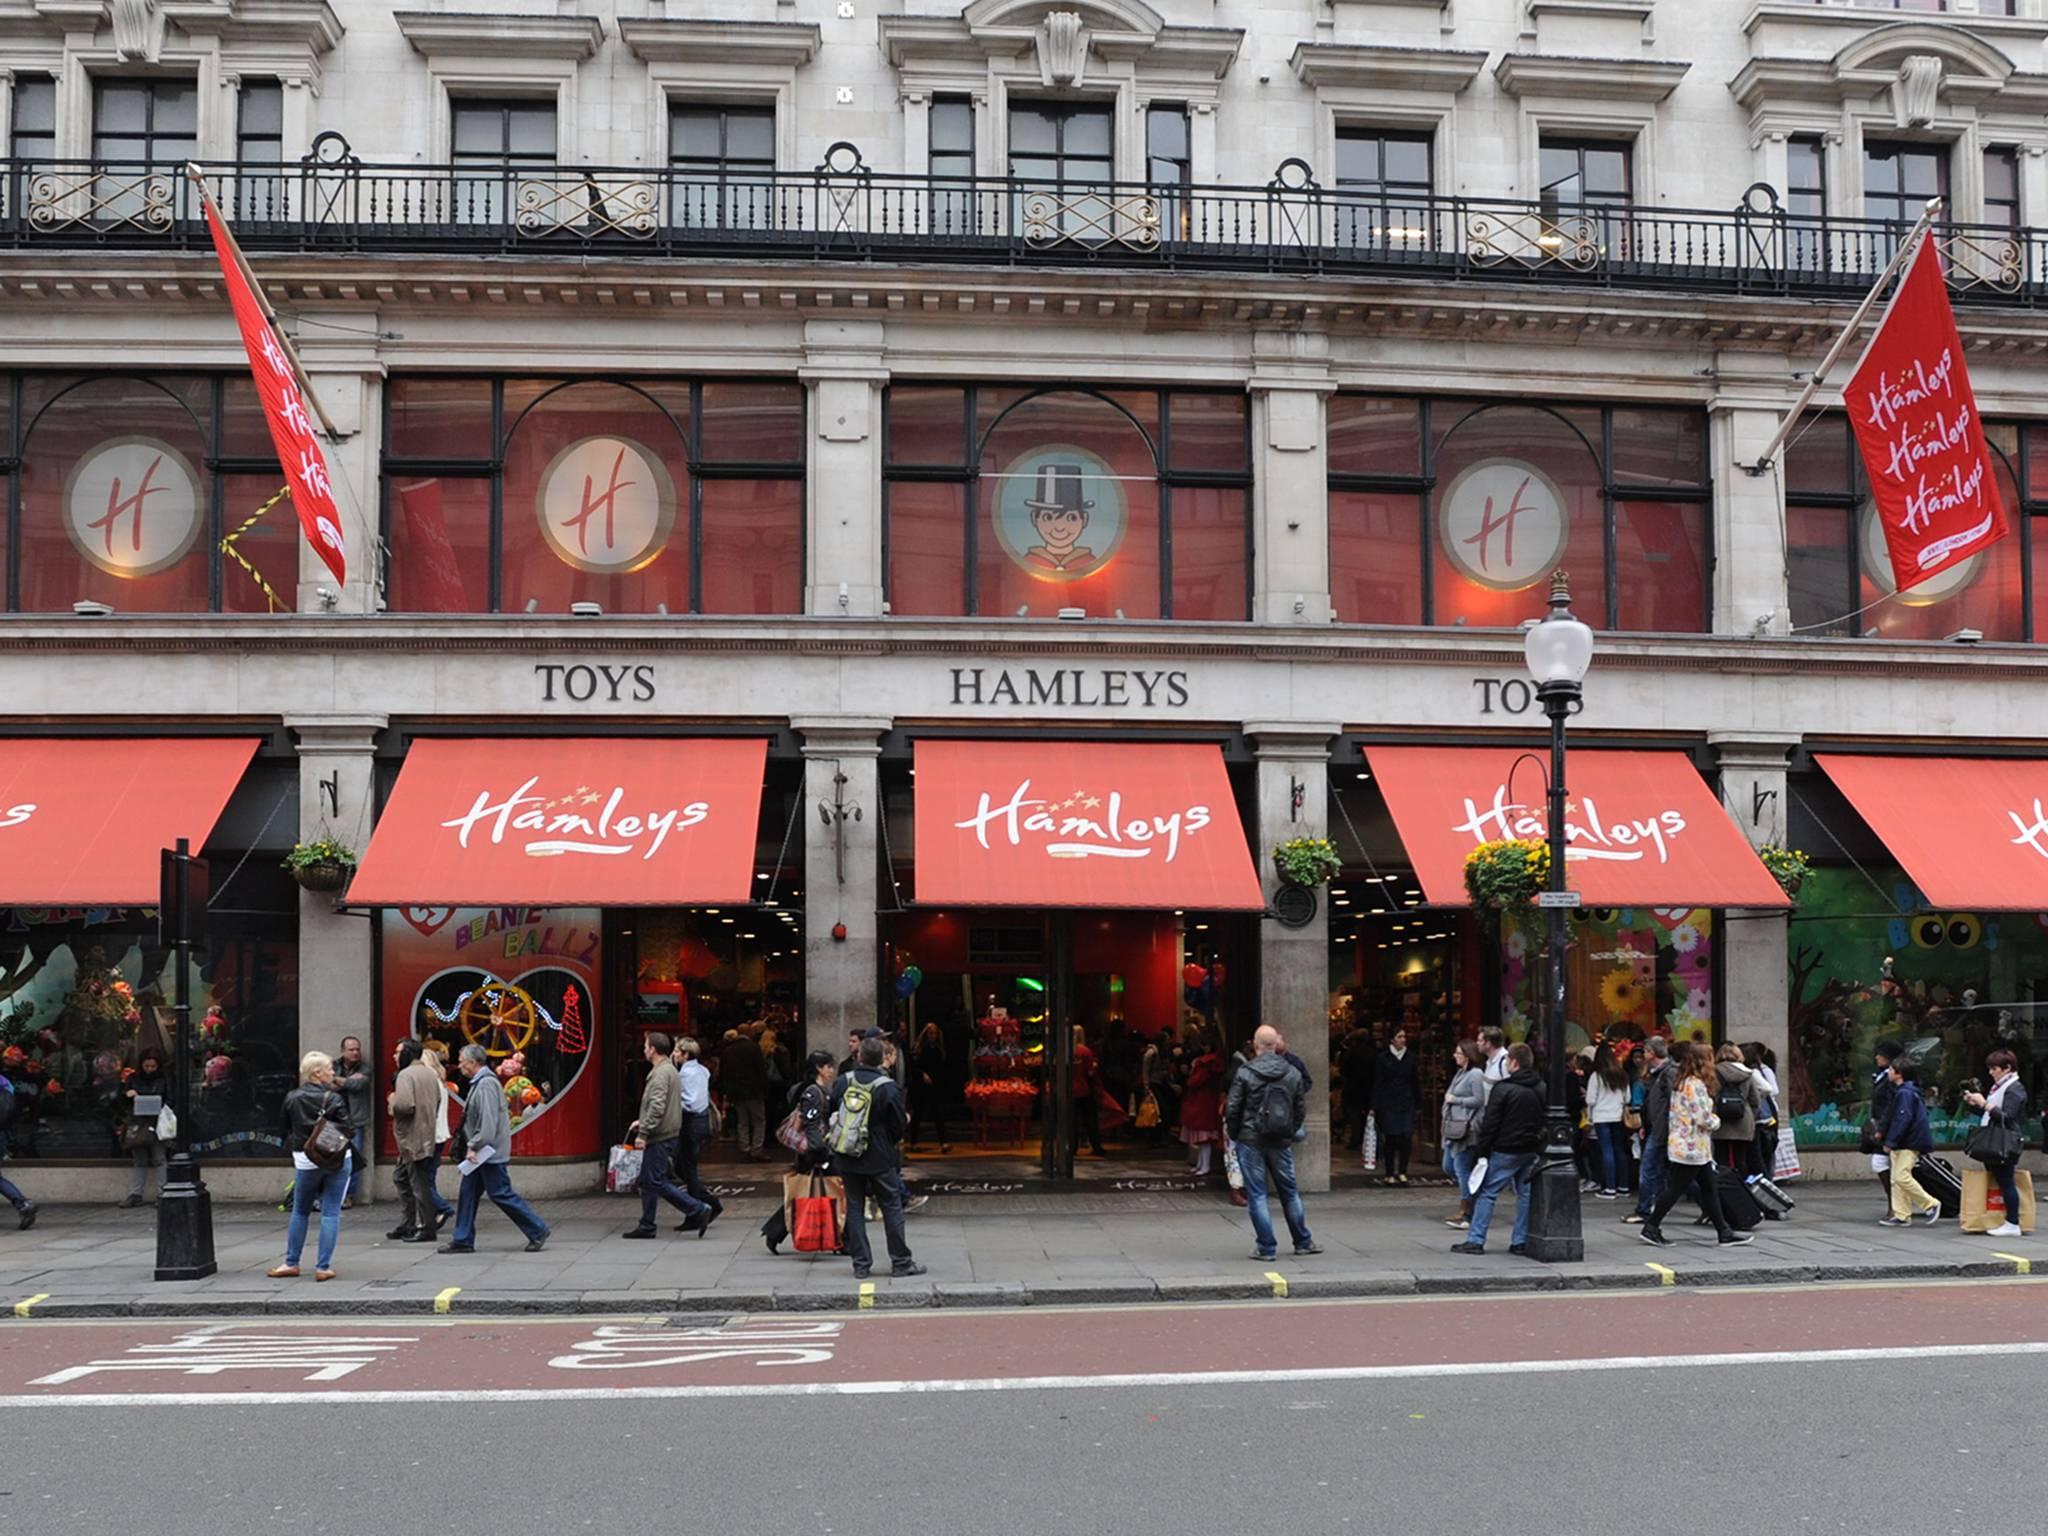 Hamleys Toy Store Regent Street, London